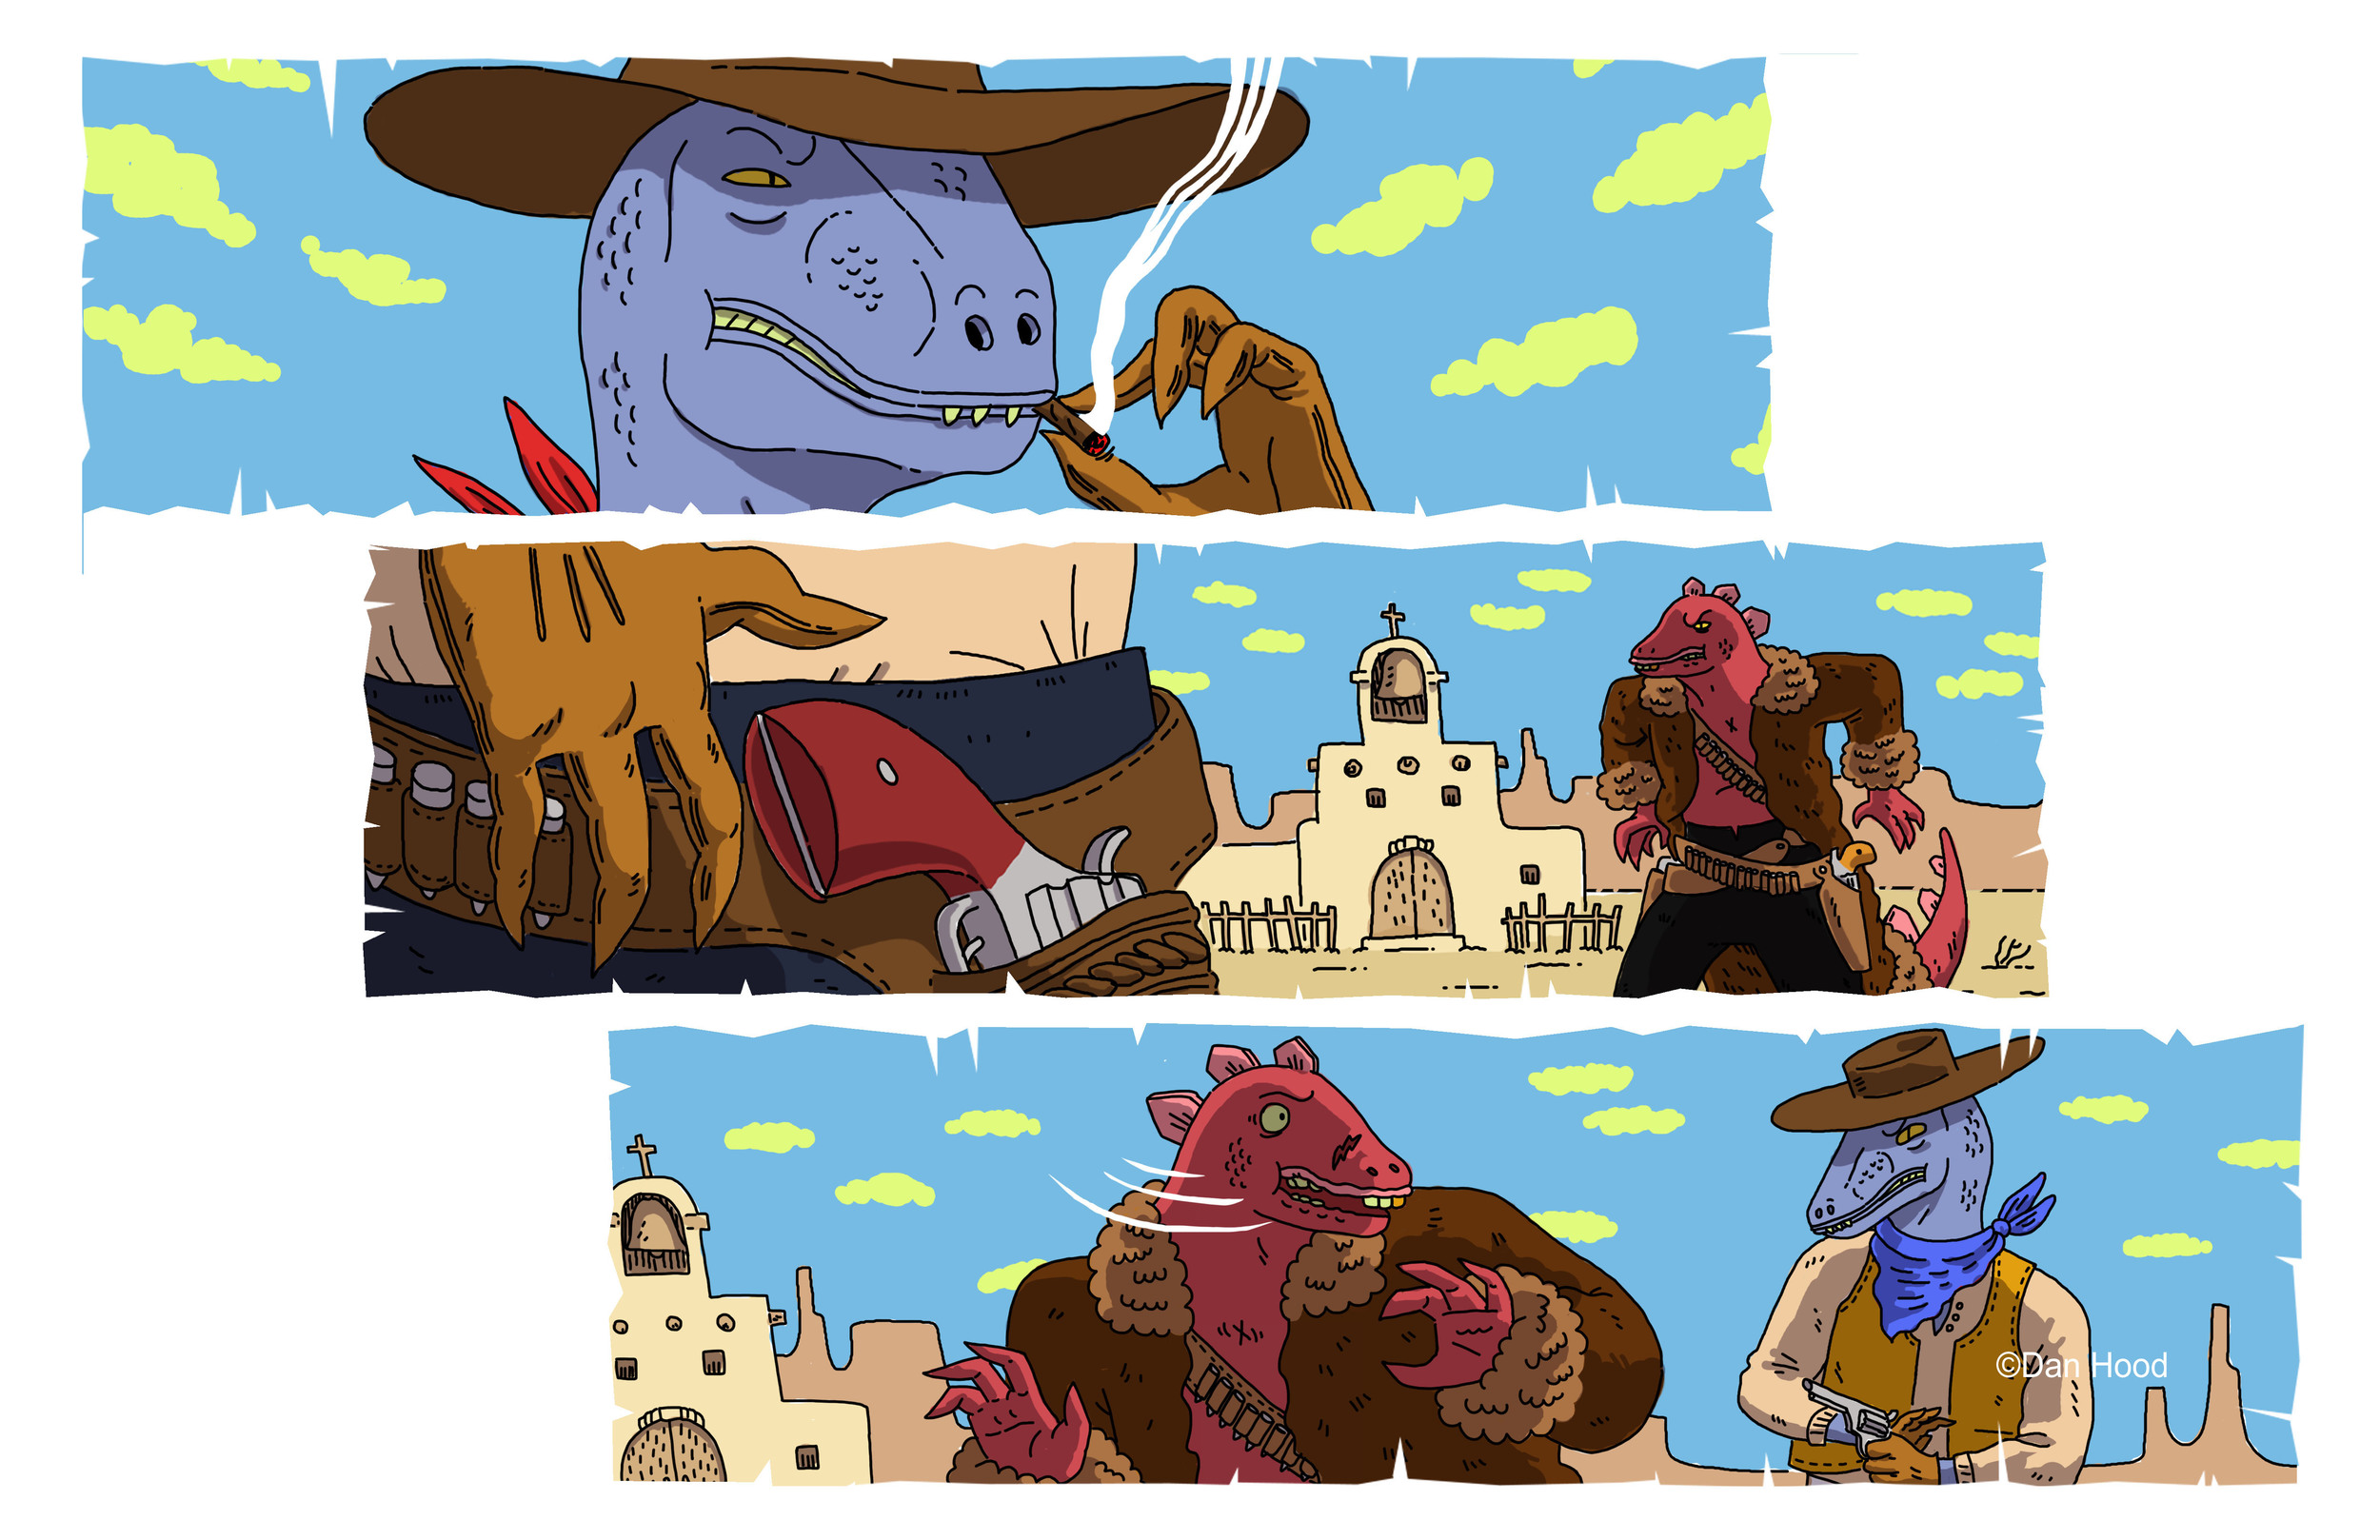 Digital - Concept art for animation